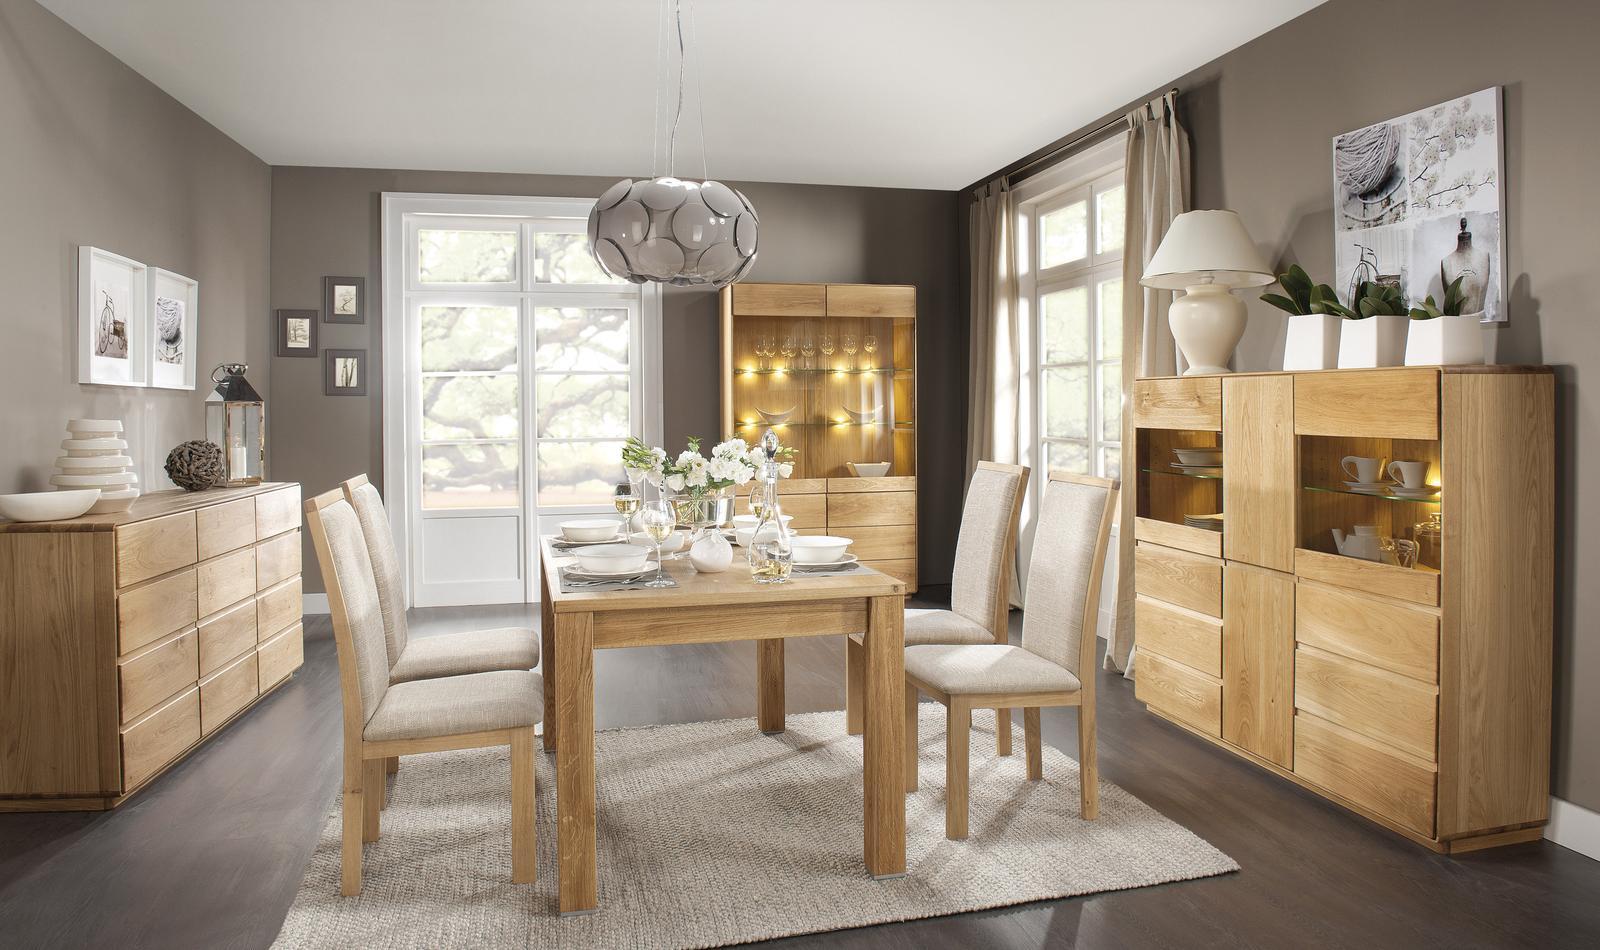 Dubový nábytok do obývačky... - Obrázok č. 2